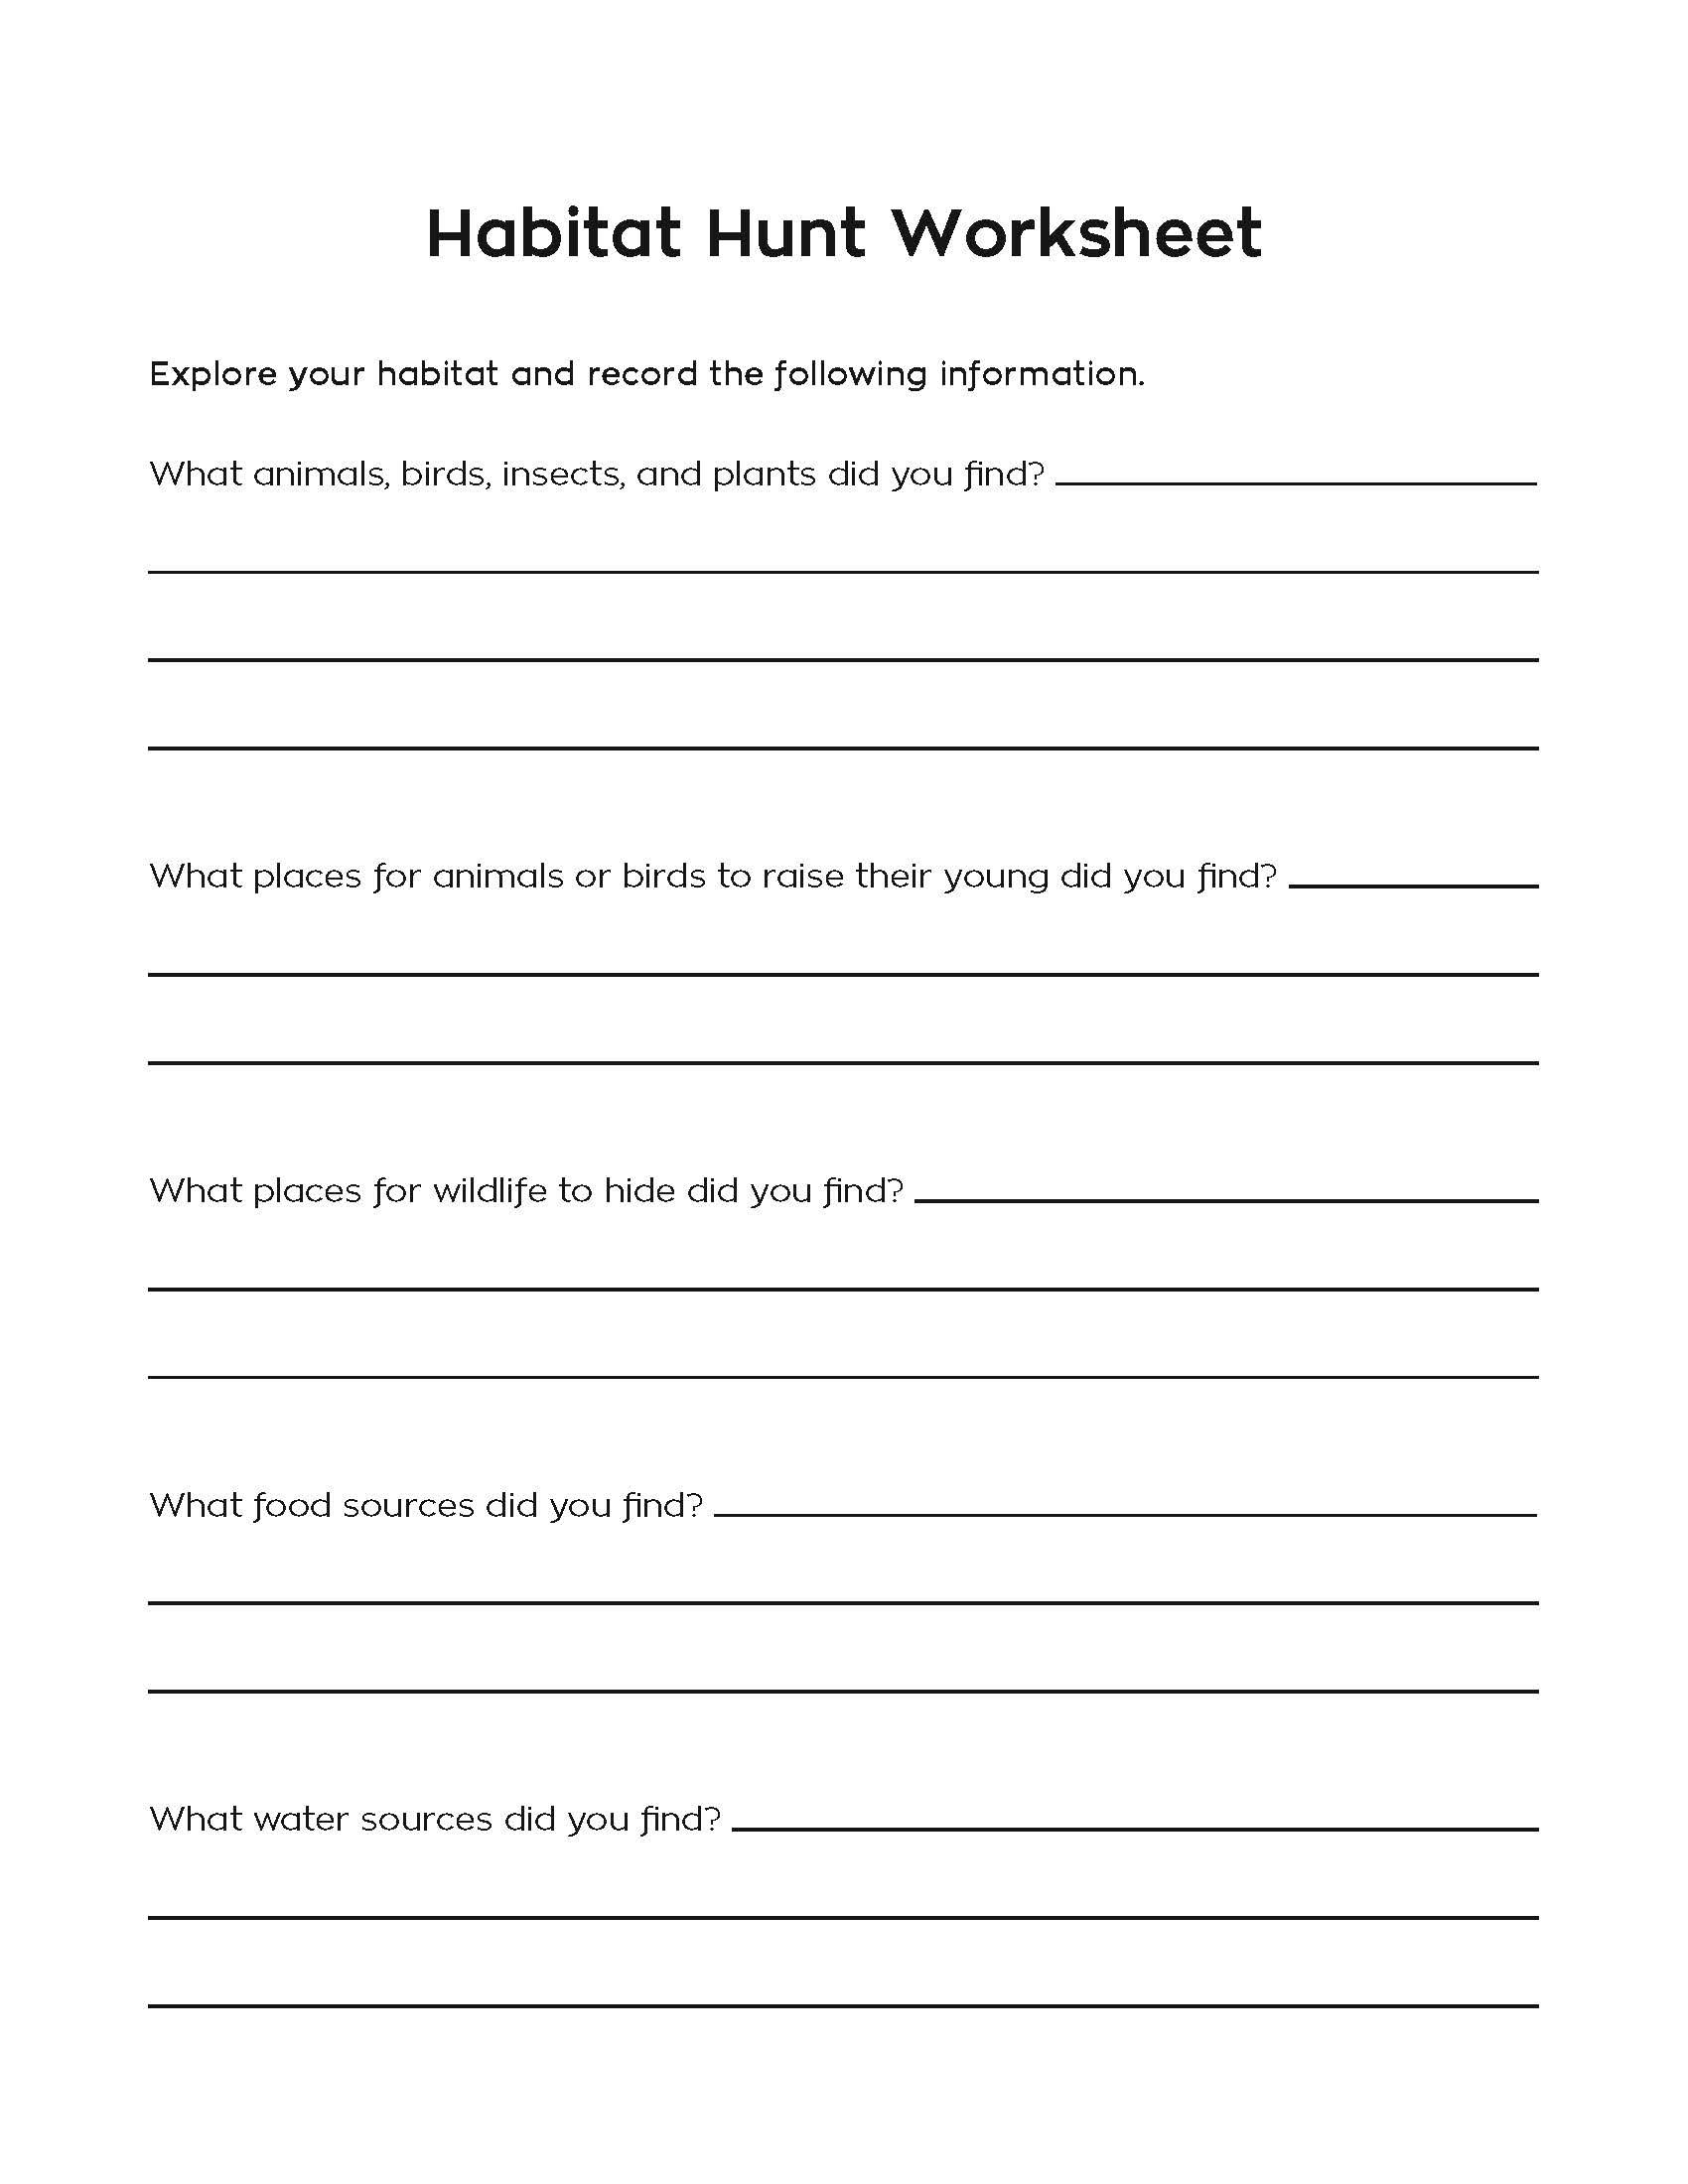 Meeting 12: Use this worksheet for your Habitat Hunt   Kids worksheets  printables [ 2200 x 1700 Pixel ]